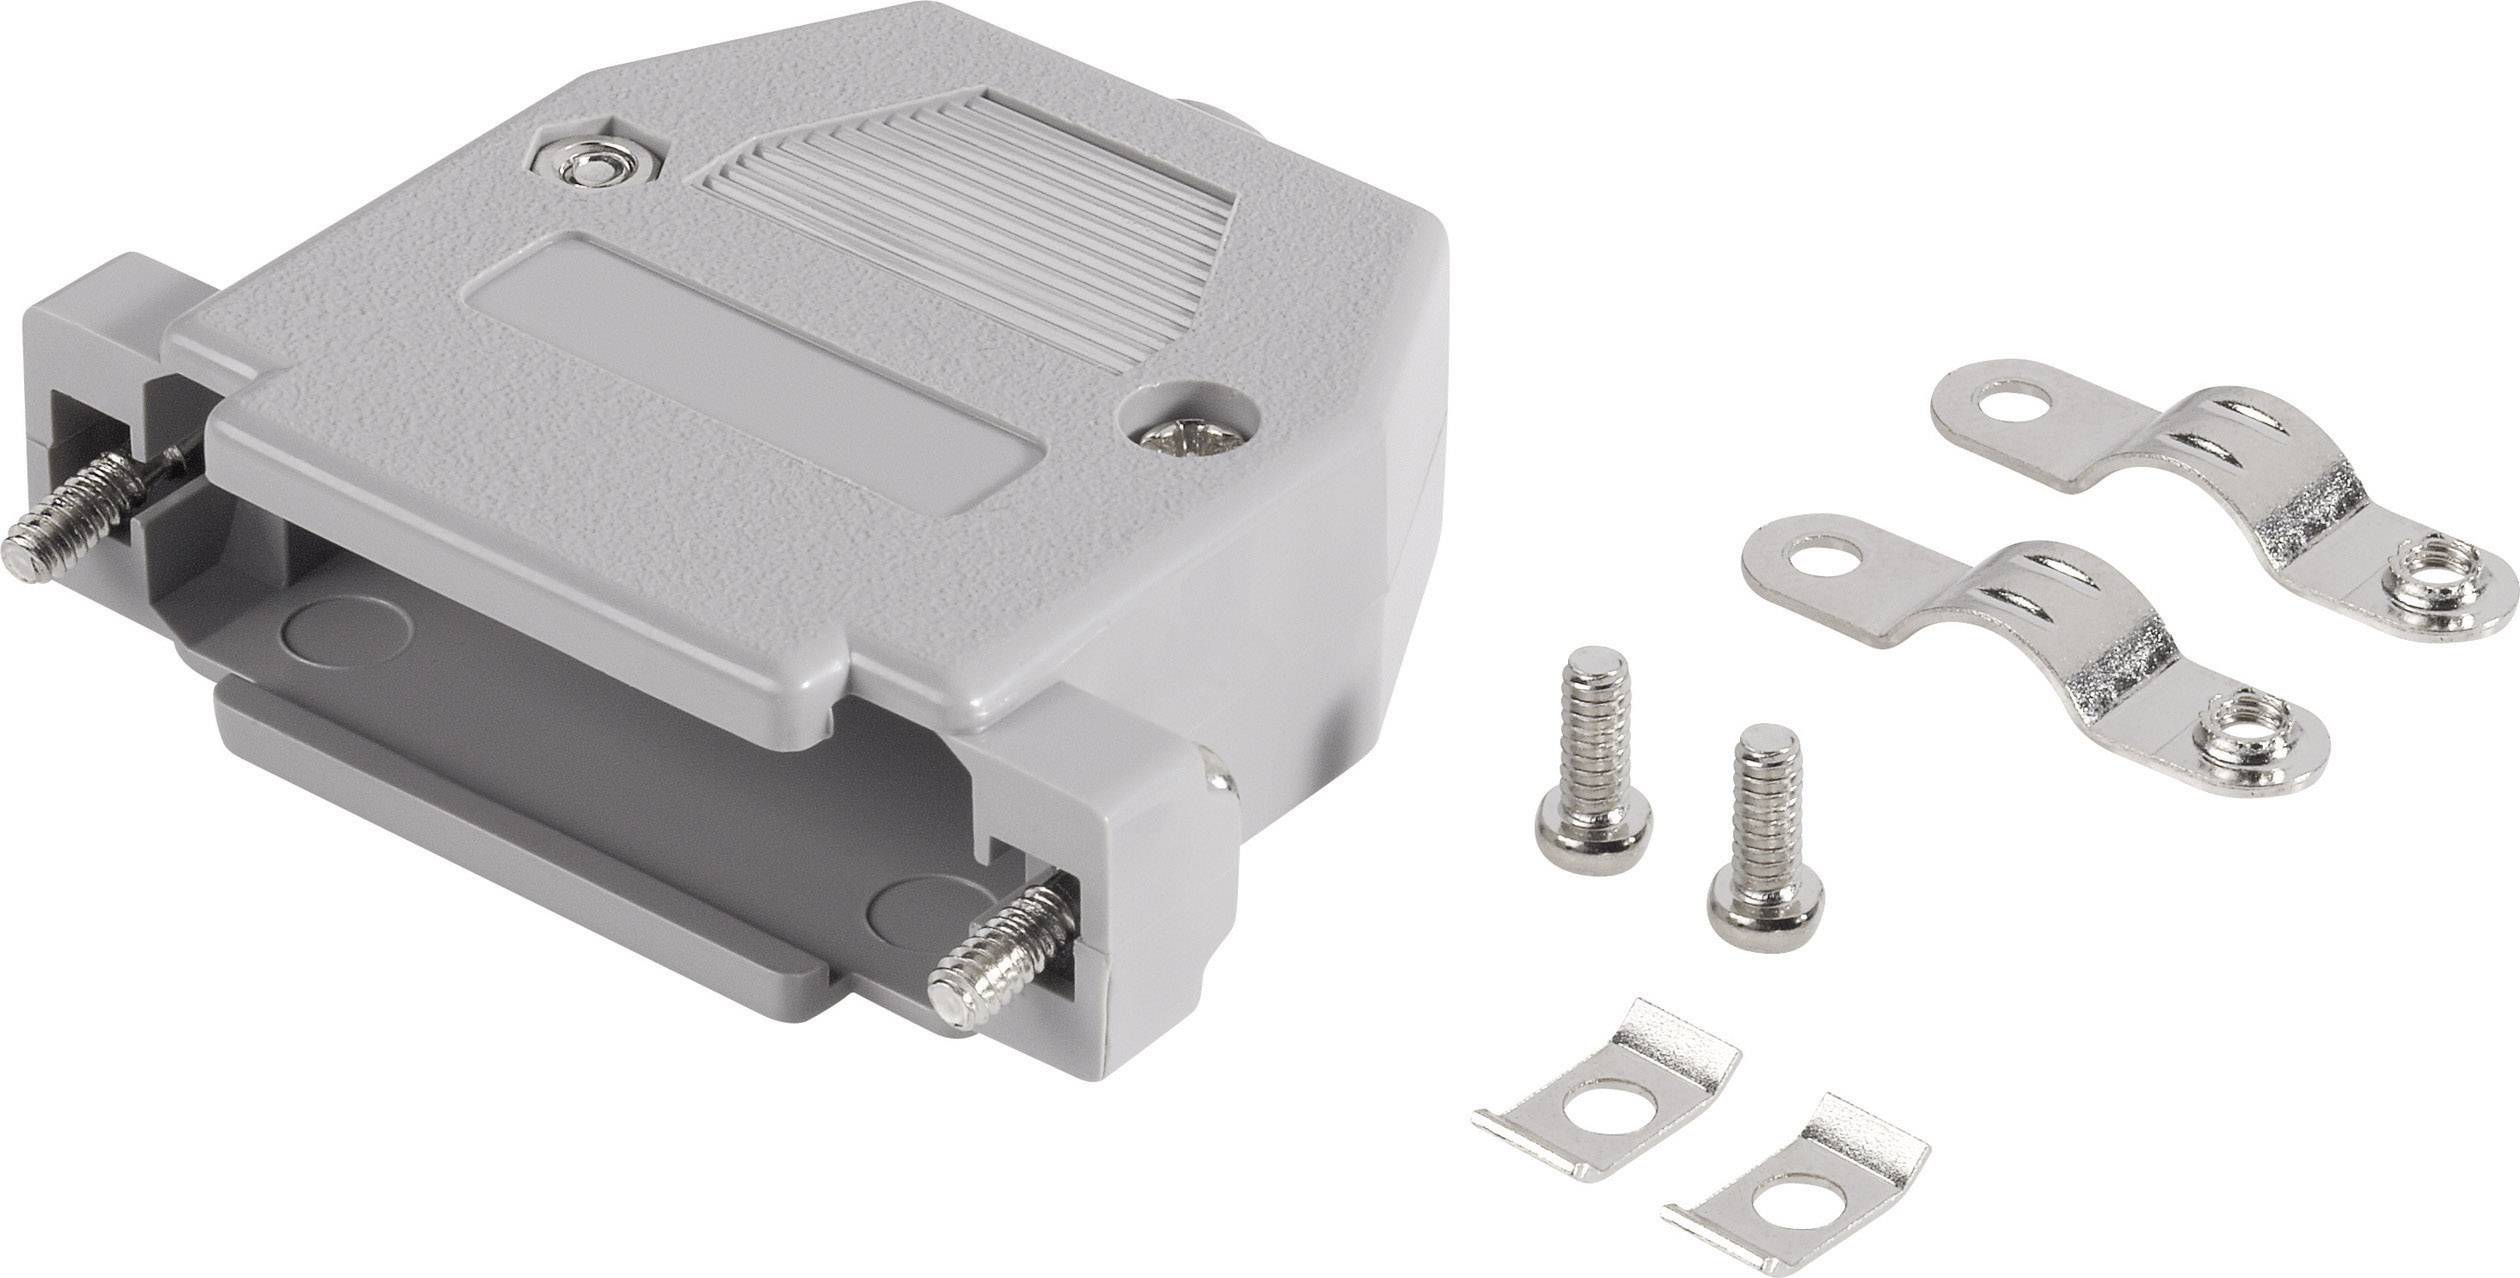 D-SUB púzdro BKL Electronic 10120060 10120060, počet pinov: 9, plast, 180 °, sivá, 1 ks